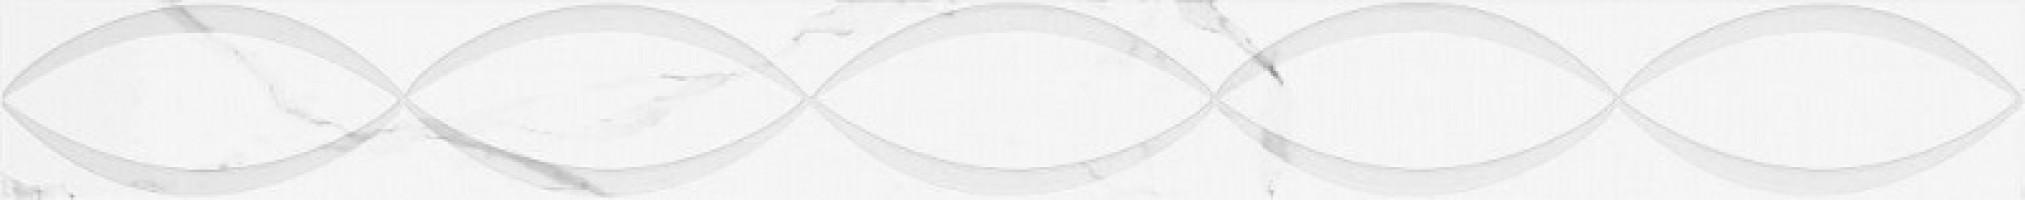 Бордюр 05-01-1-46-05-01-2625-2 Purity Assol 2 белый 4x40 Creto